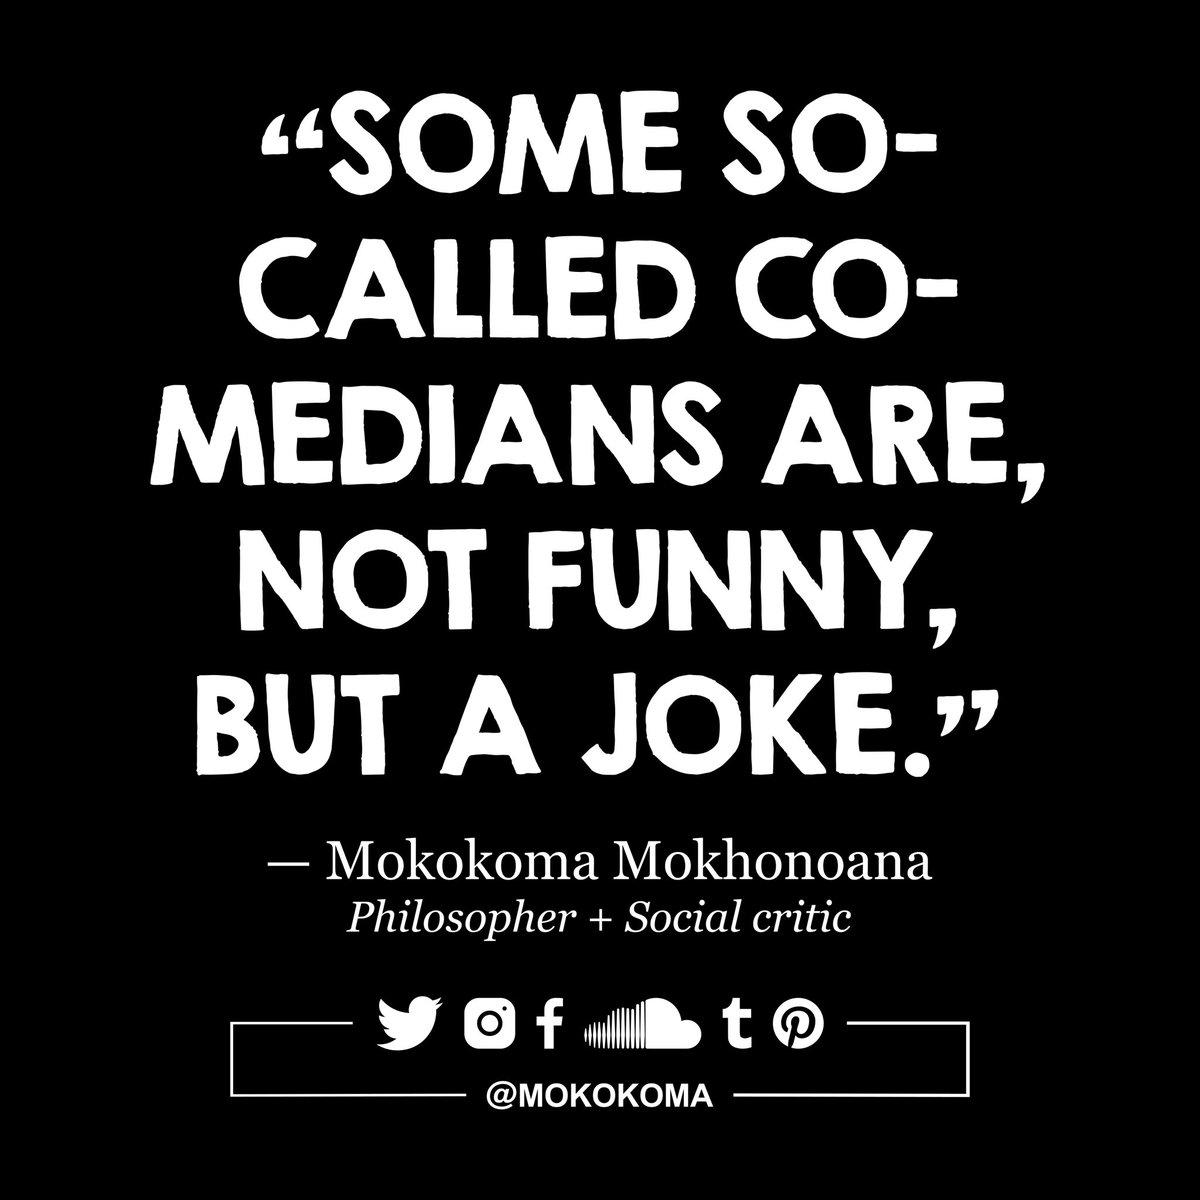 Mokokoma Mokhonoana On Twitter Subscribe To Get My New Aphorisms